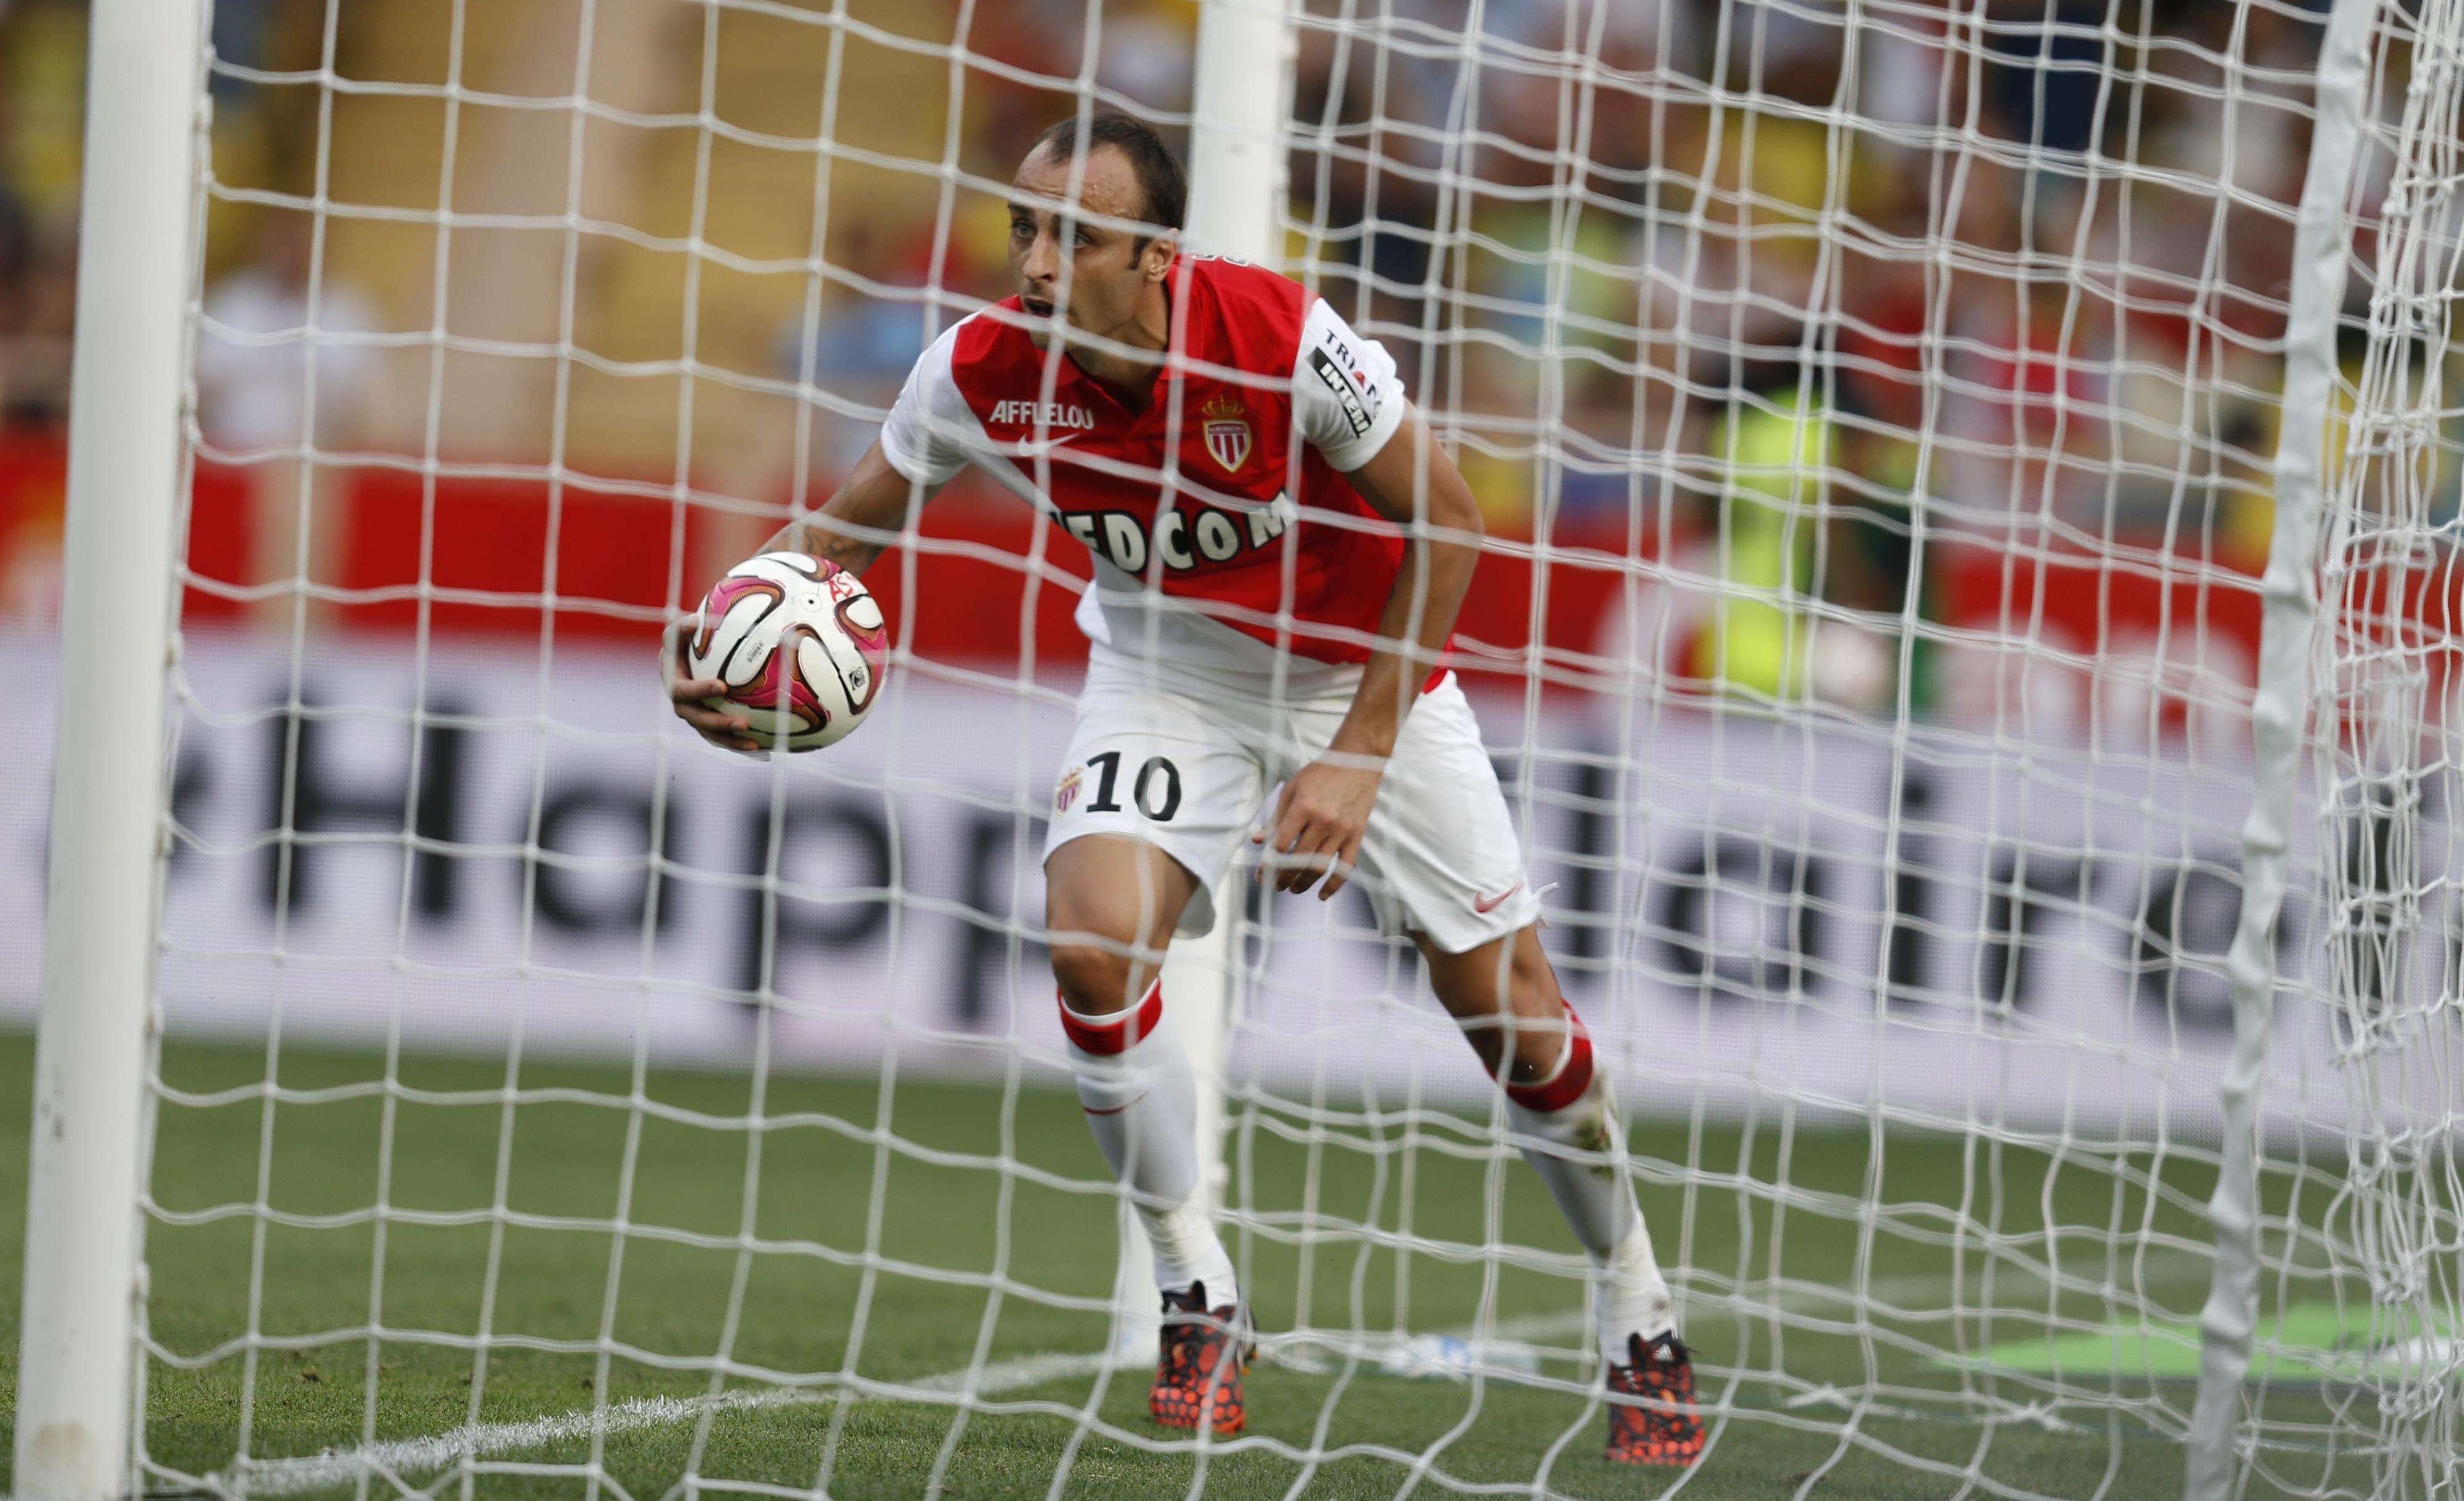 Mónaco sufre para rescatar empate 1-1 ante Lille